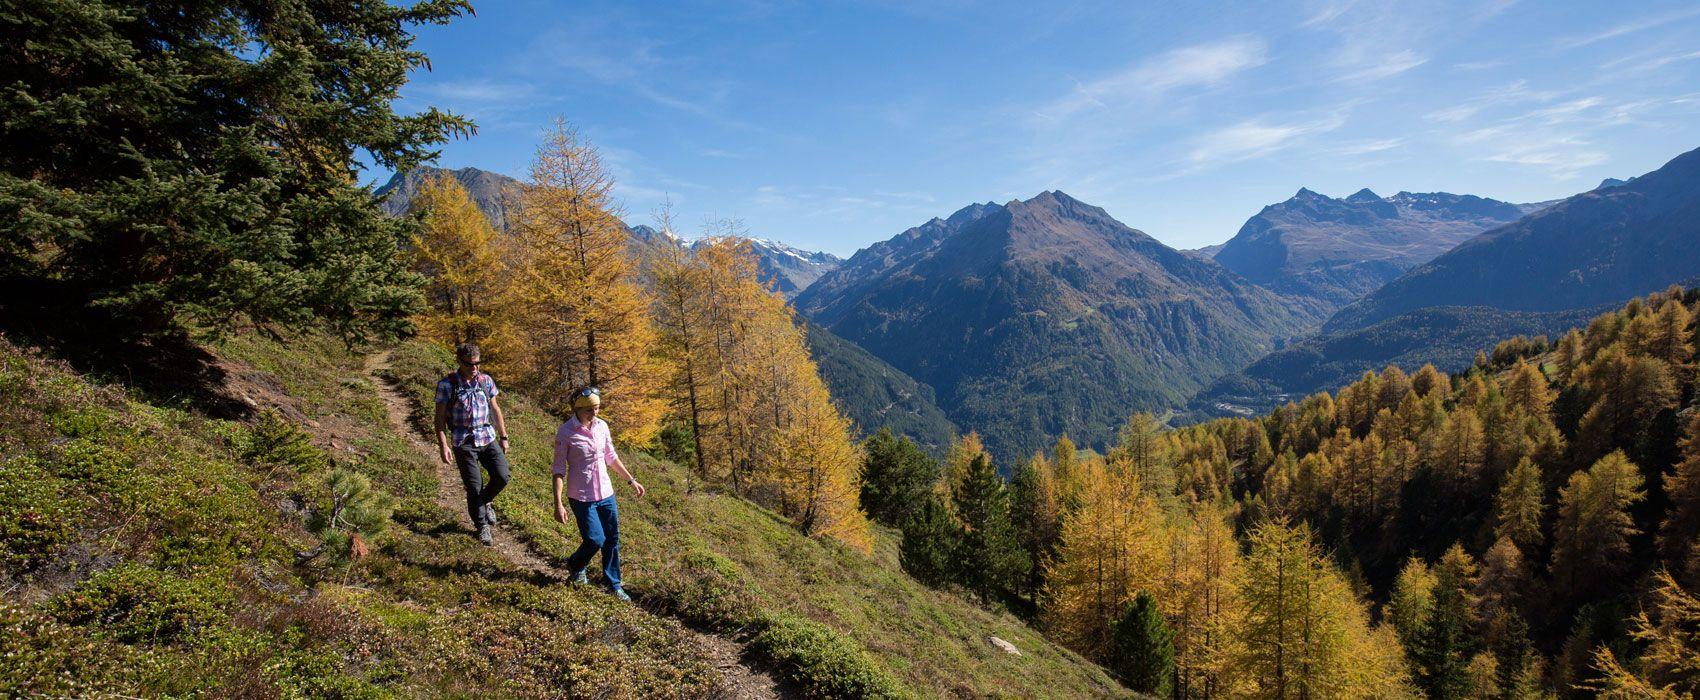 Wandern in den Ötztaler Alpen